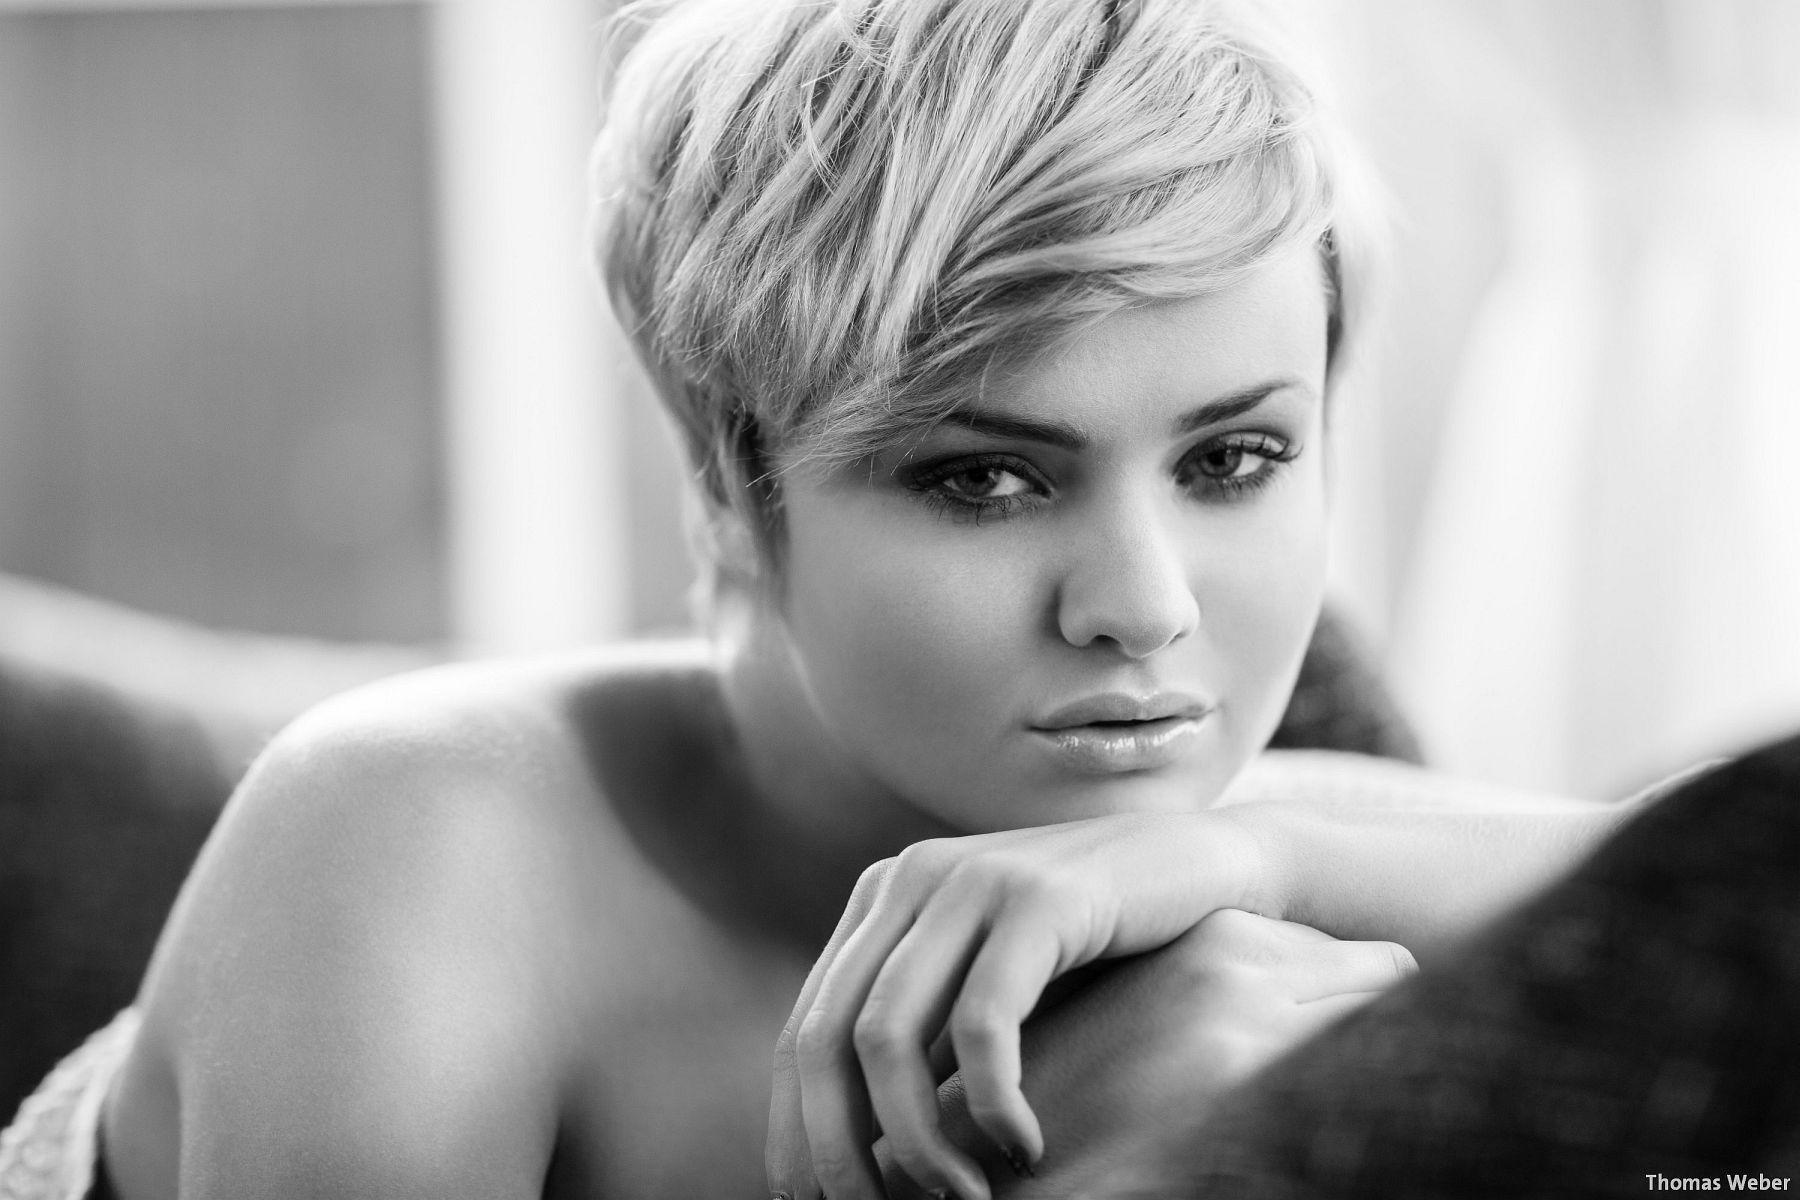 Fotograf Thomas Weber aus Oldenburg: Spontane Beauty-Portraits im Oldenburger Fotostudio (1)